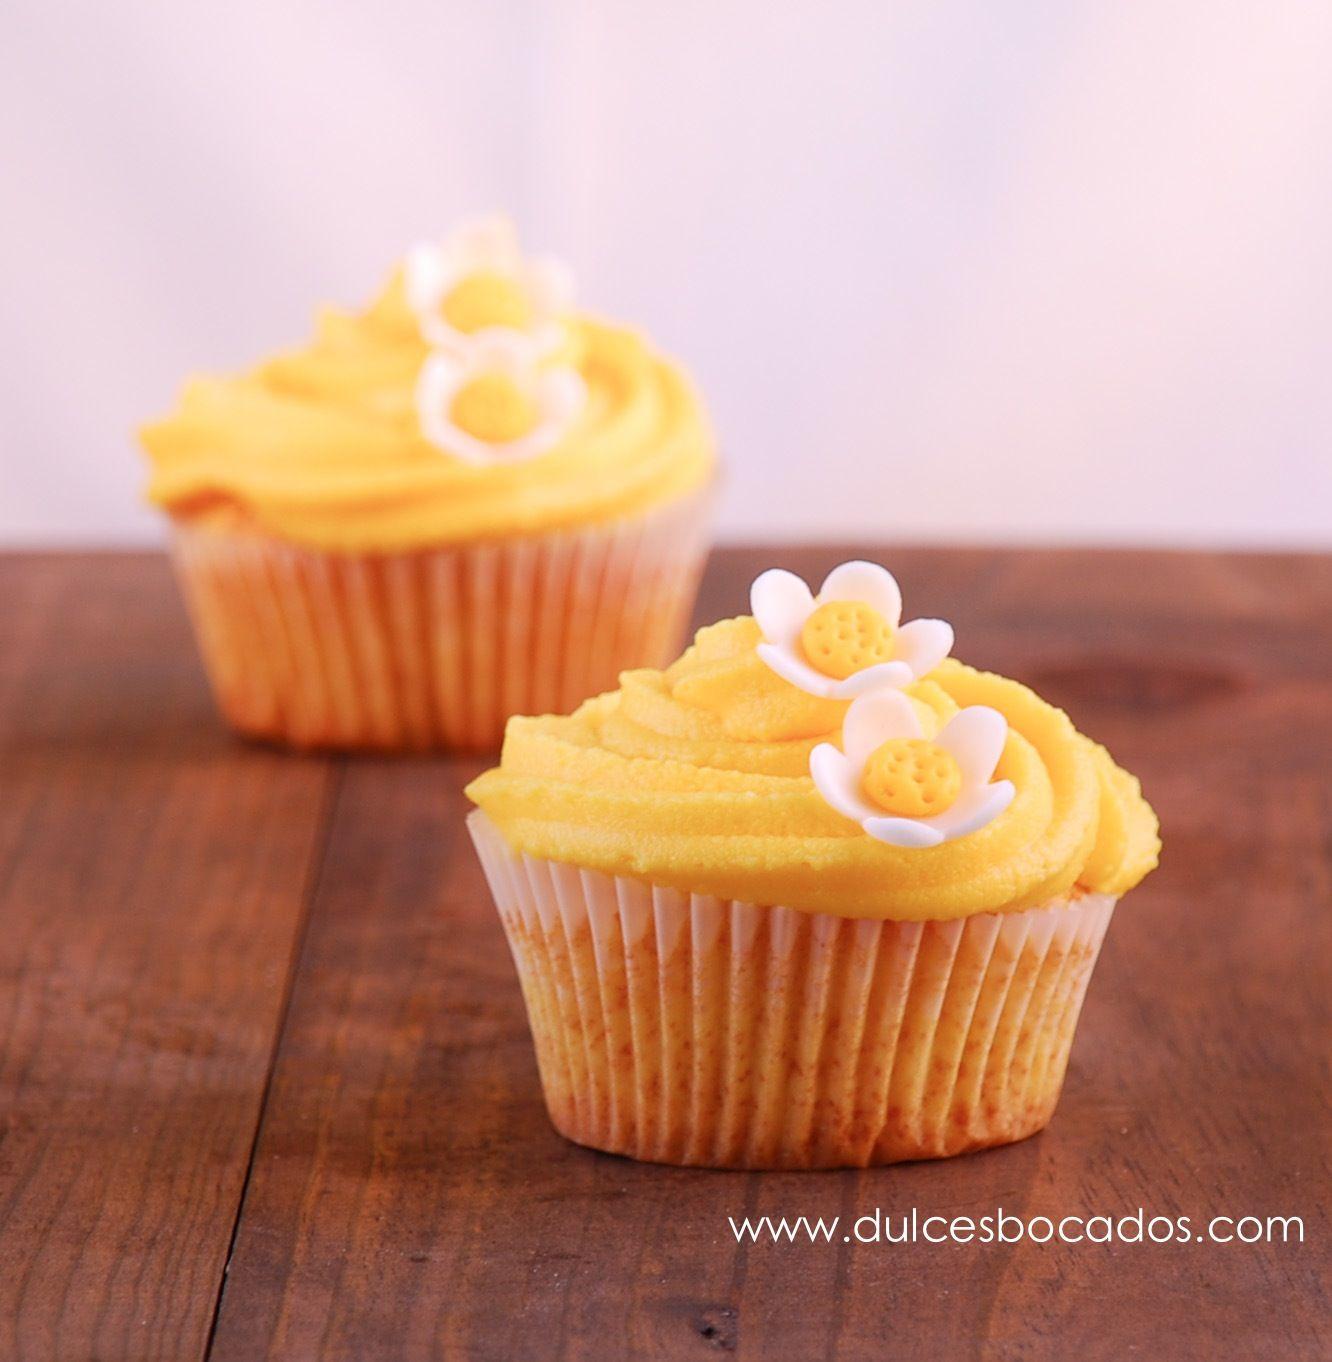 2d95b9869f2ea92ebfe713433a533e97 - Cup Cakes Recetas